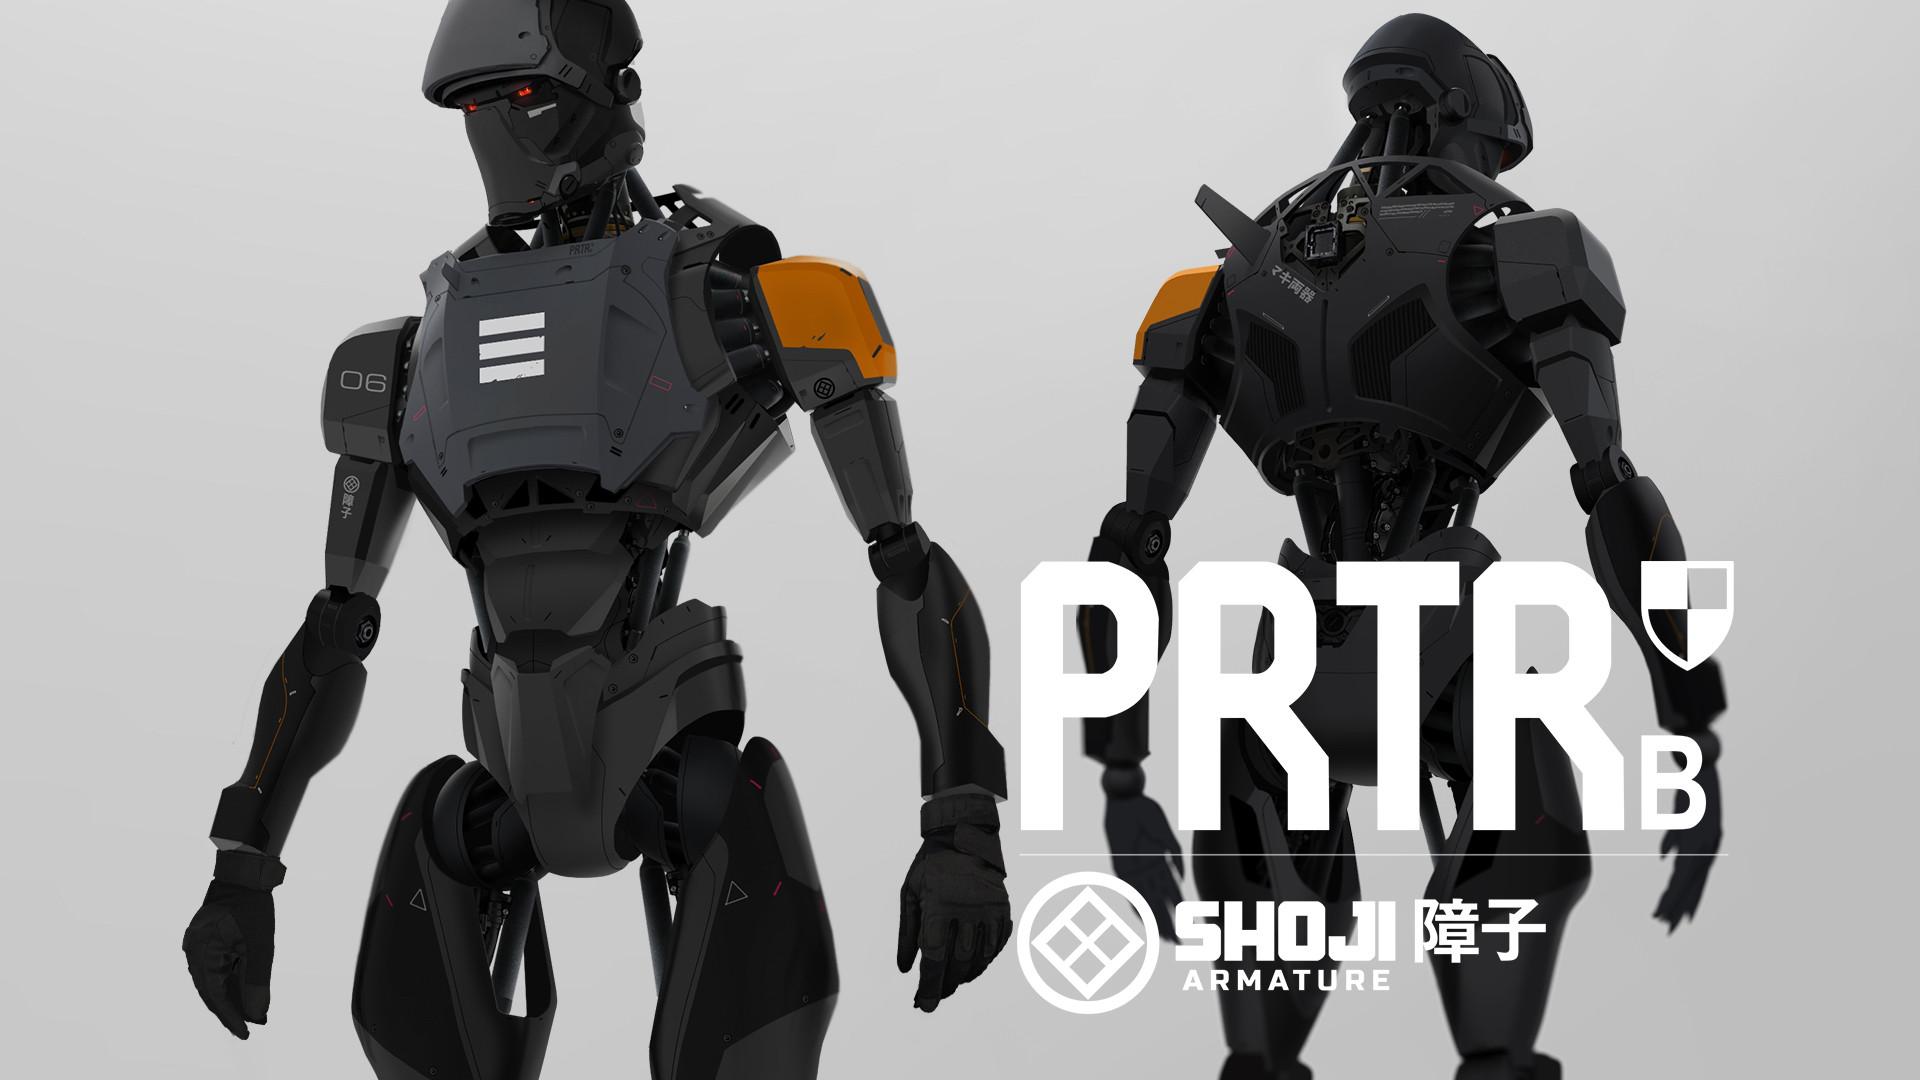 PRTR_01.jpg